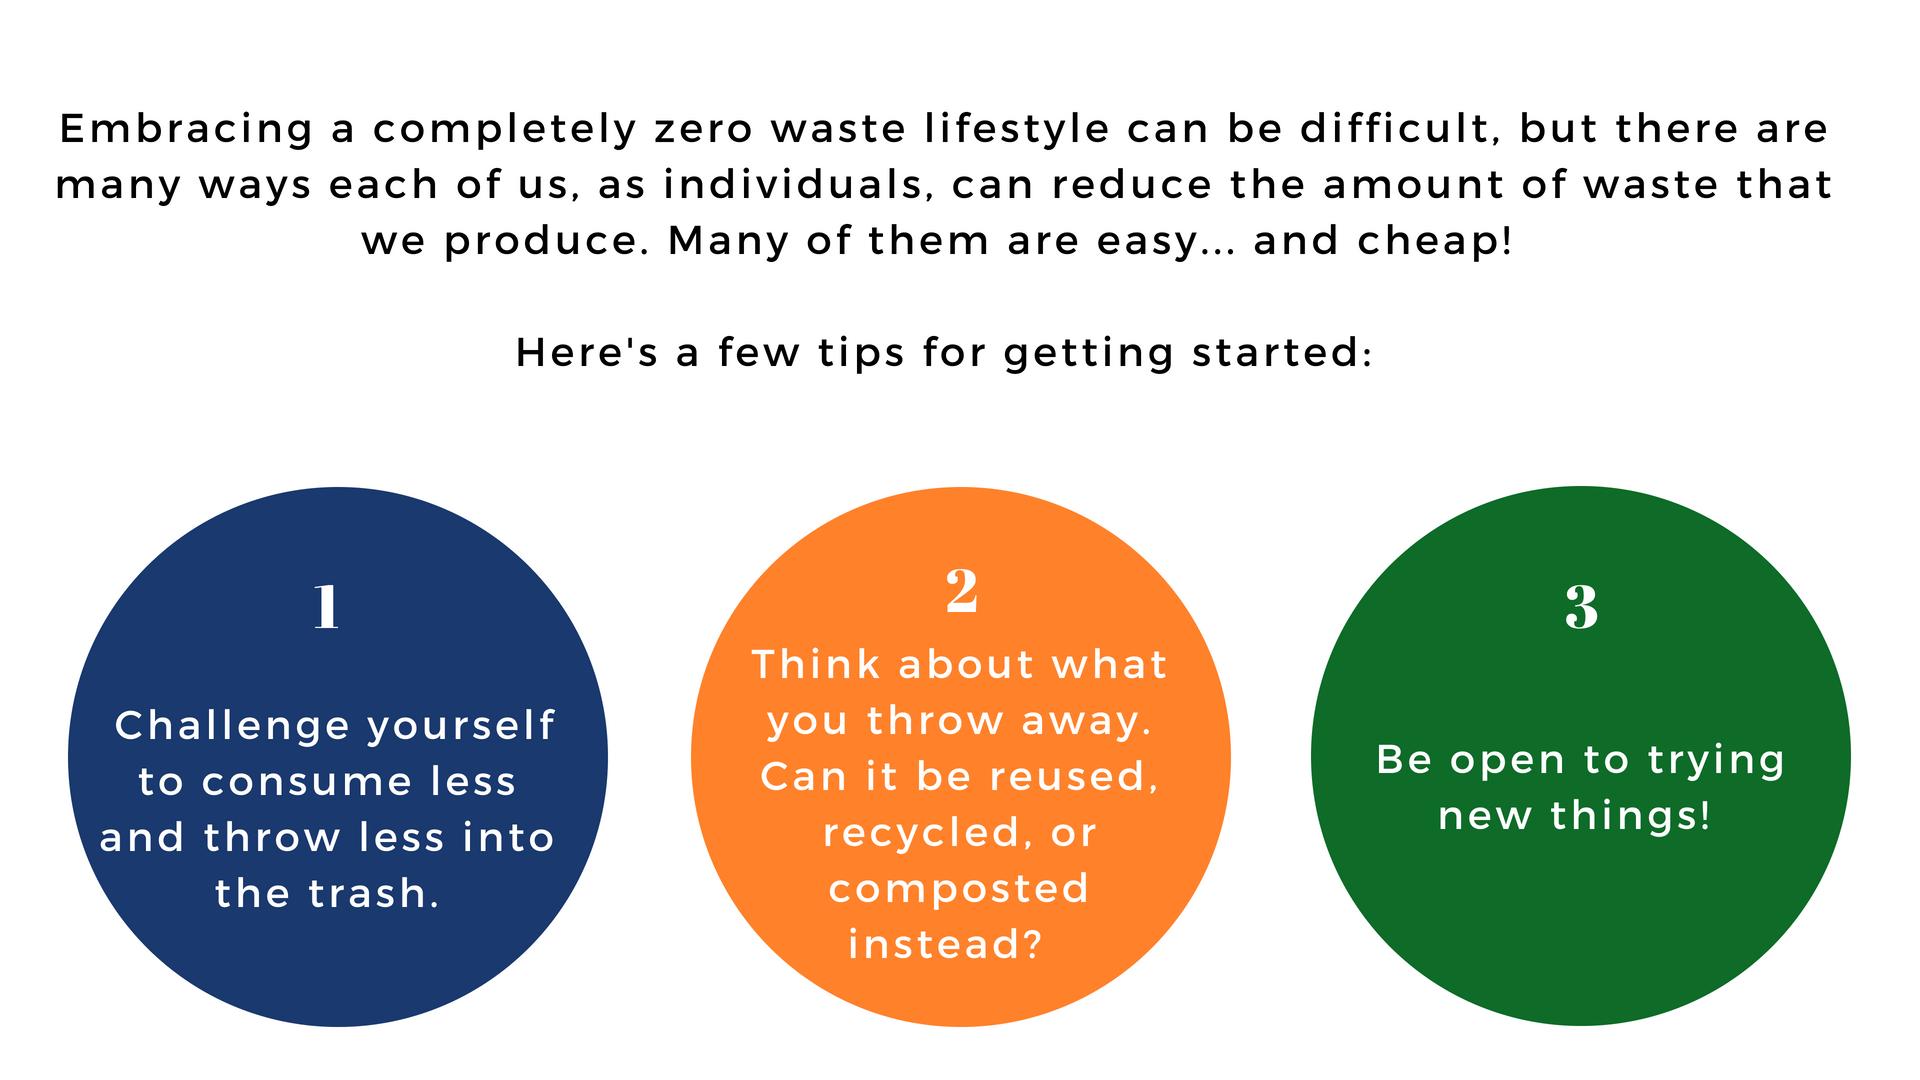 SummerScienceFriday   Reducing Your Trash Footprint